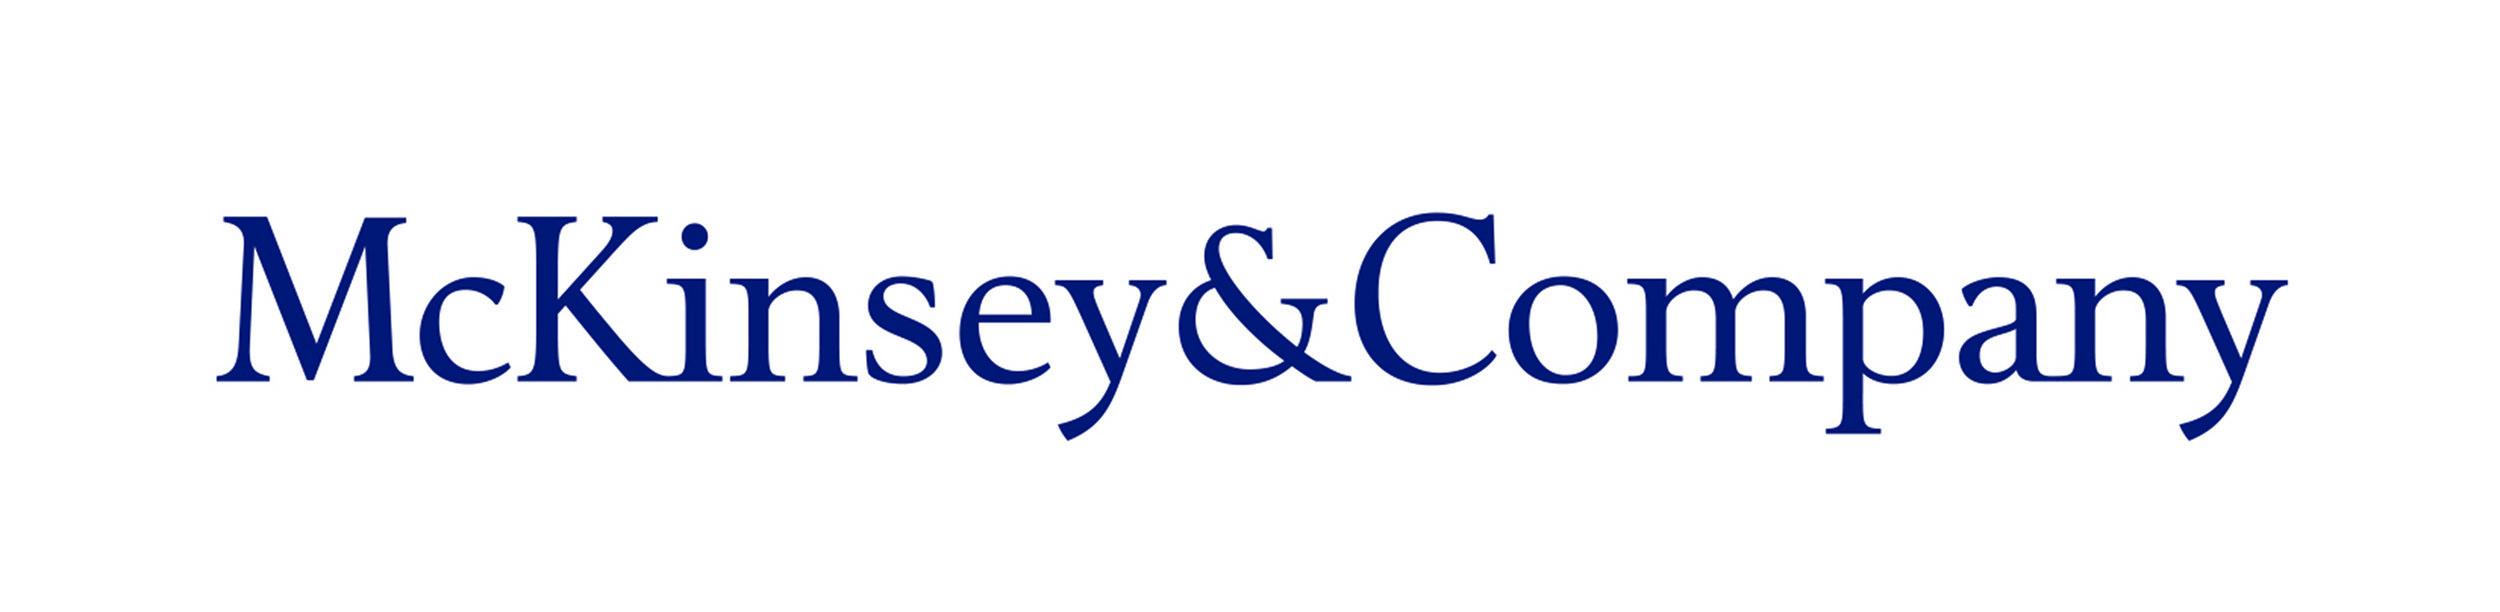 McKinsey & Company logo.jpg